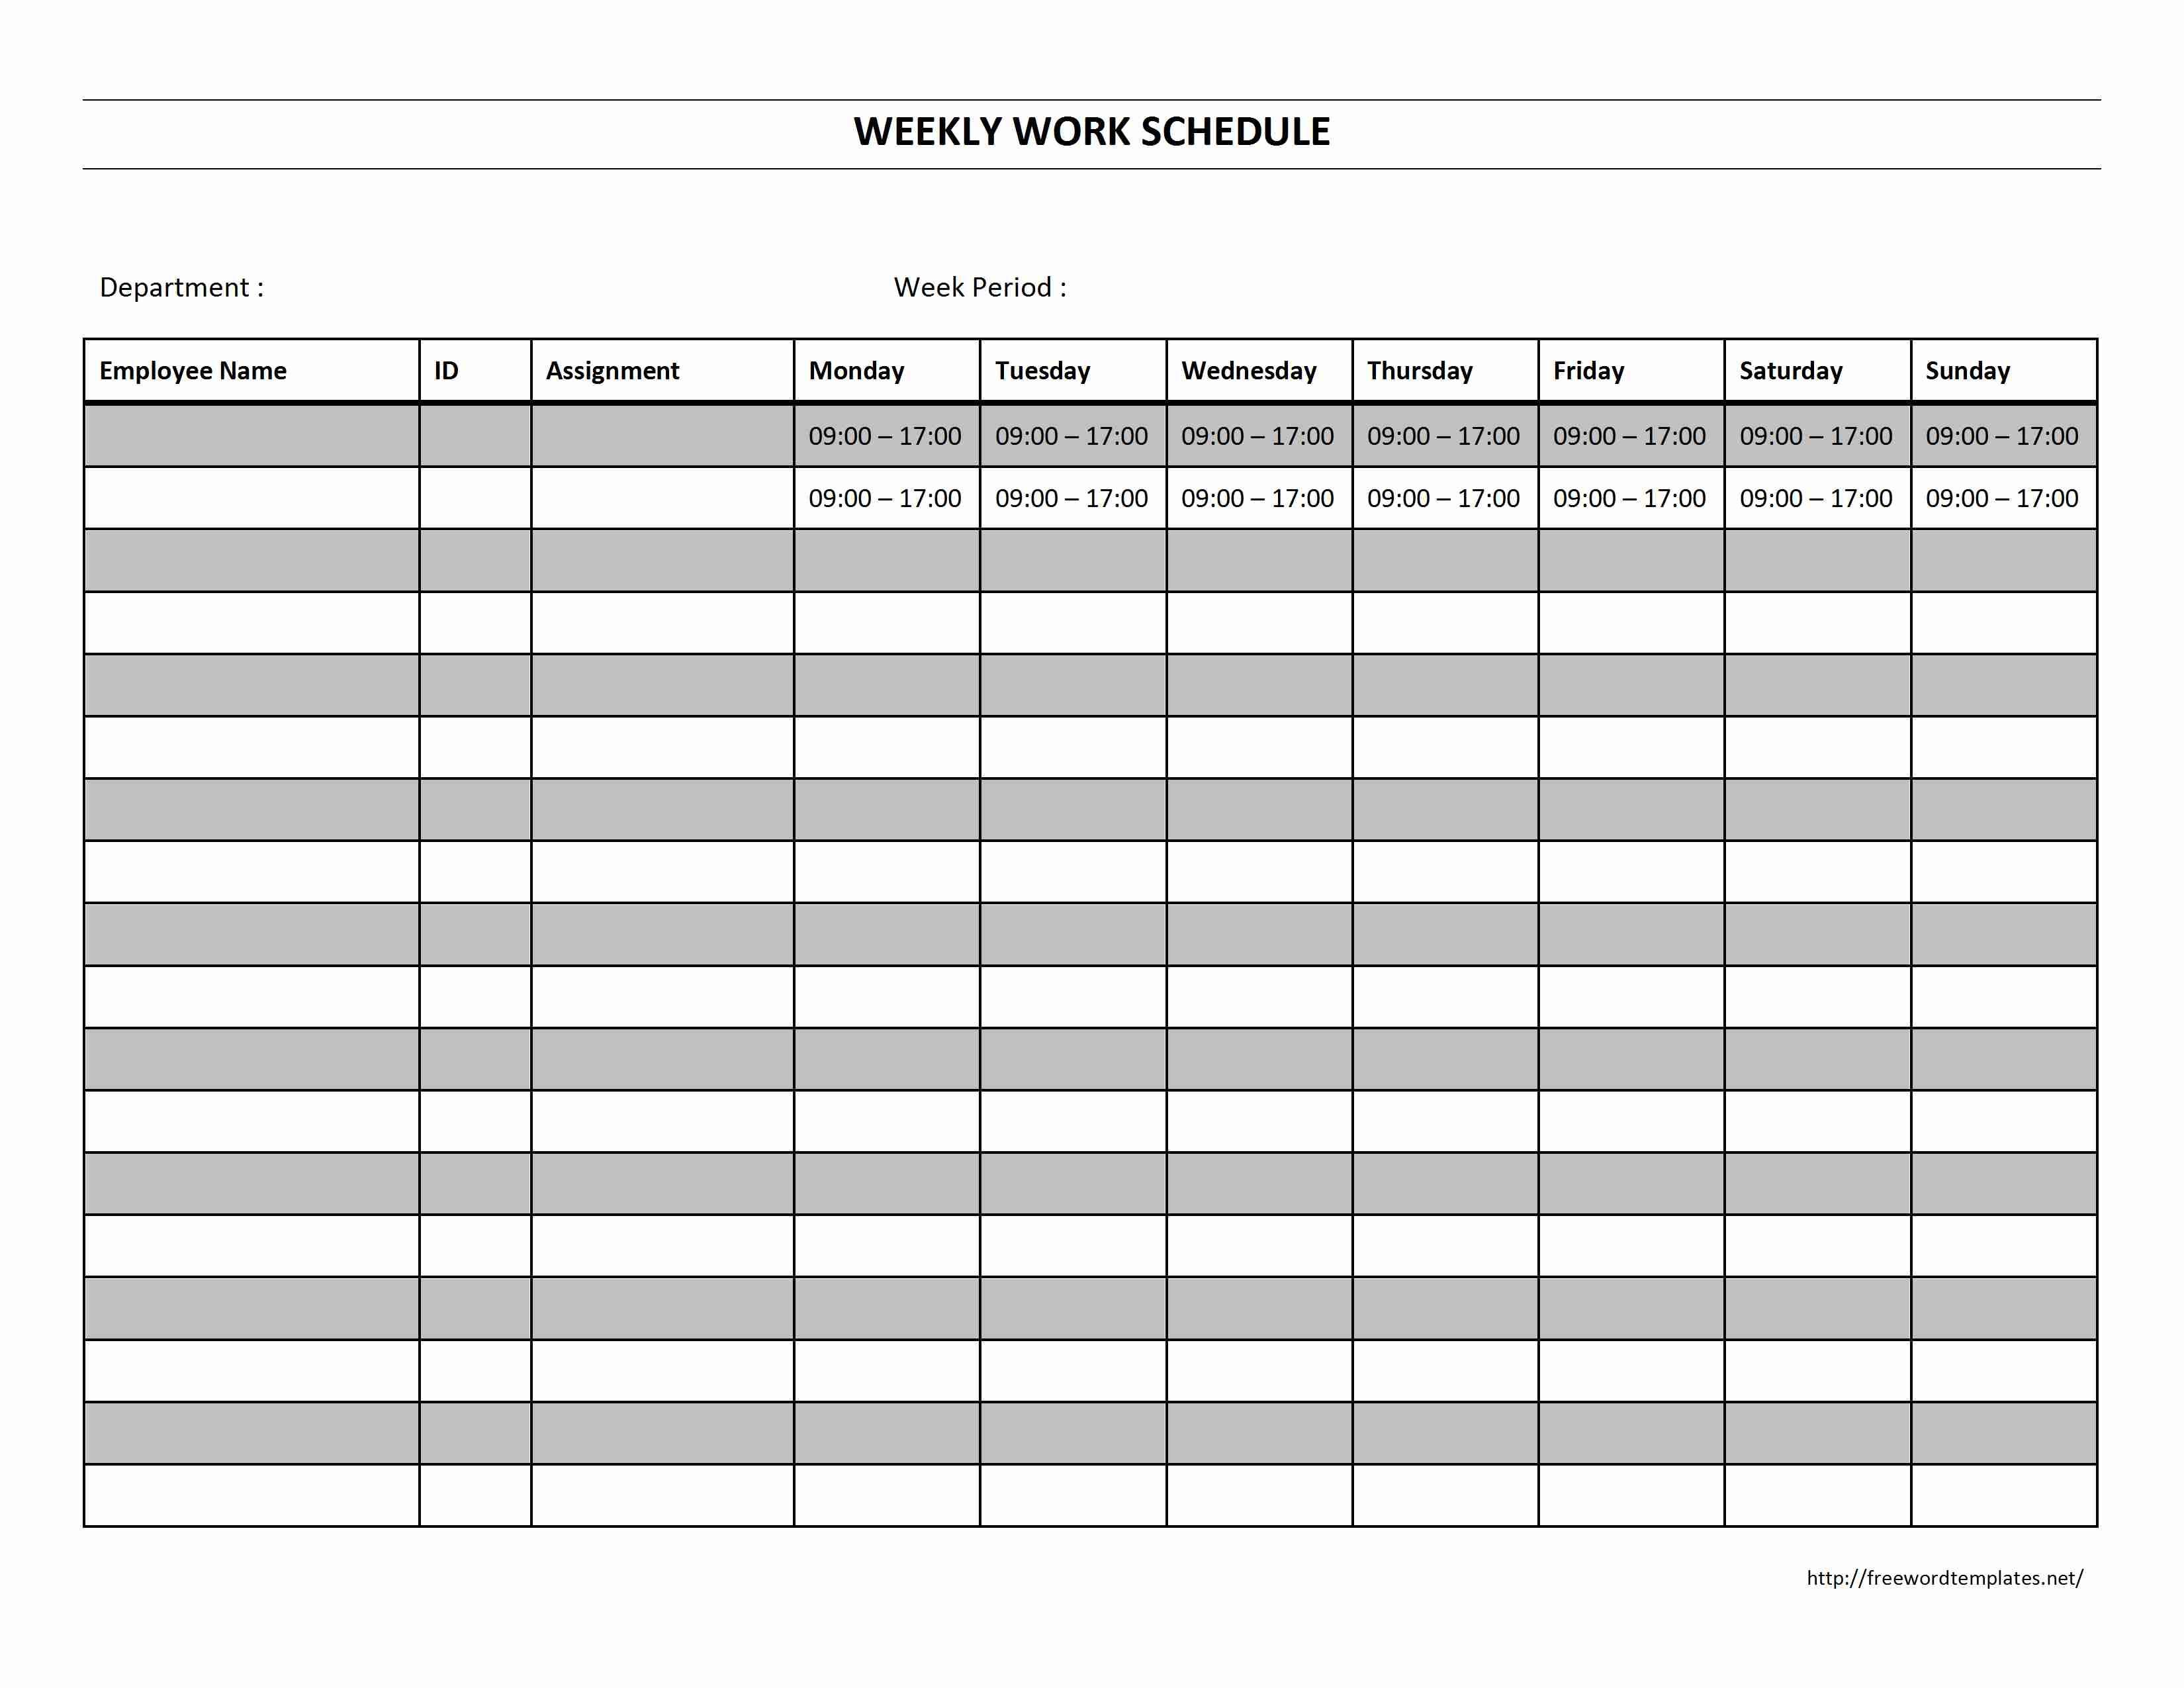 Work Schedule Blank Template Printable Free Daily Employee Weekly - Free Printable Blank Work Schedules